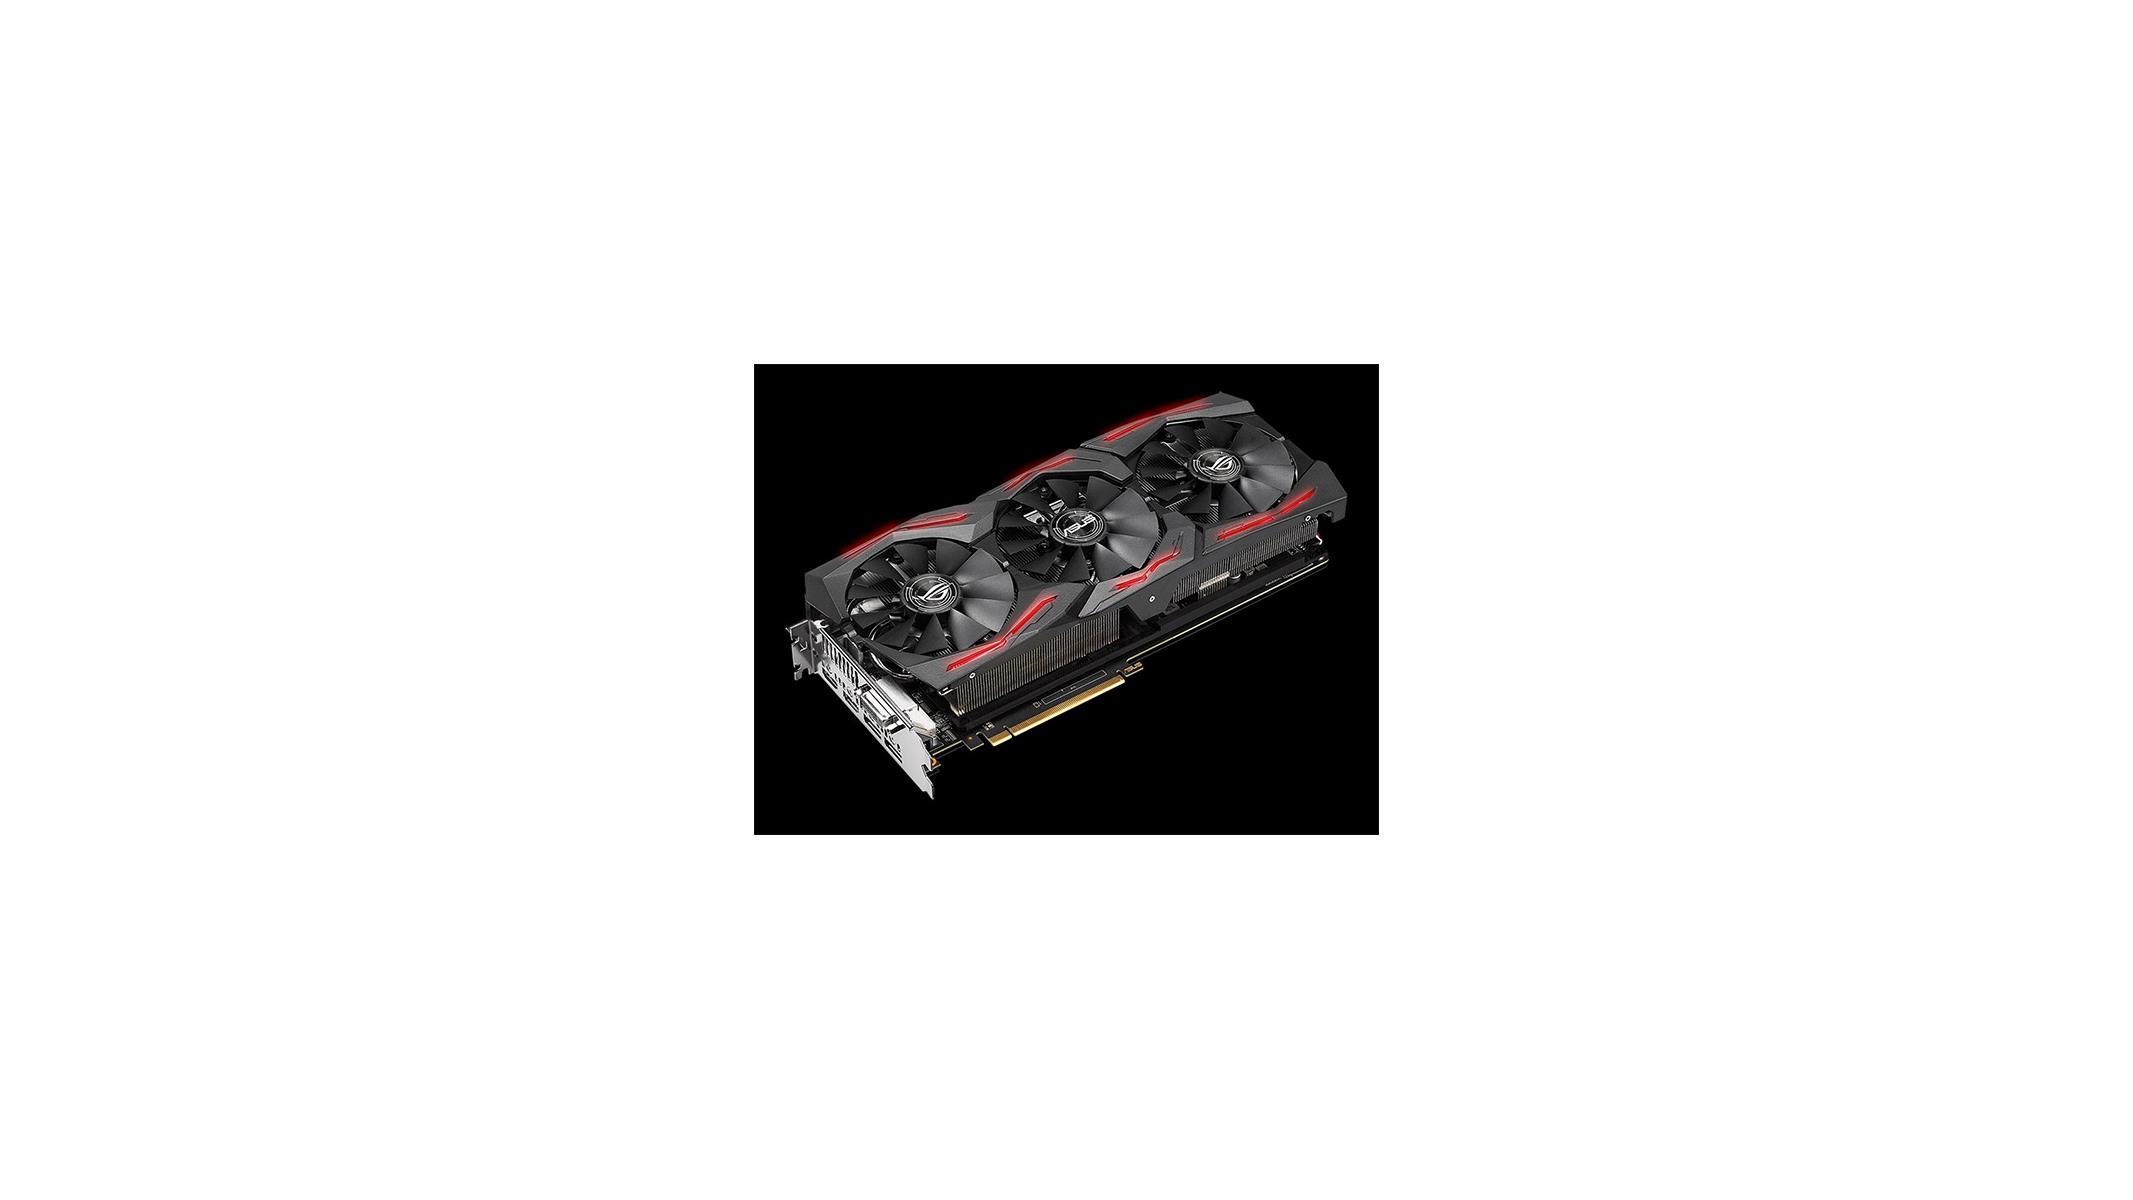 ASUS Announces Two New ROG Strix RX Vega 56 8GB Graphics